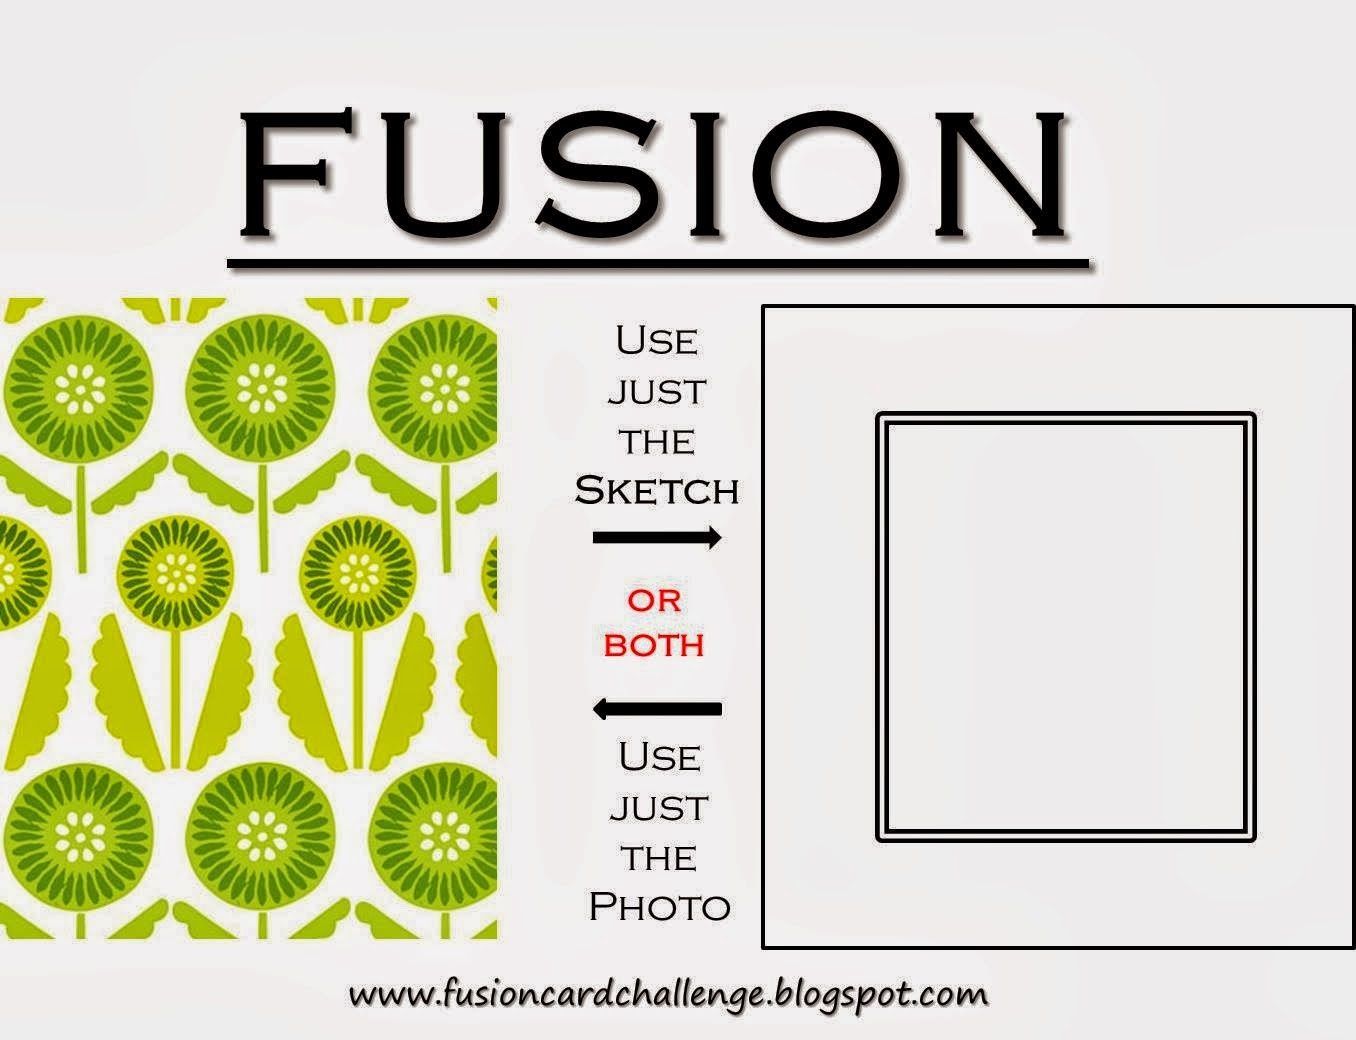 http://fusioncardchallenge.blogspot.com/2014/03/fusion-card-challenge-6.html